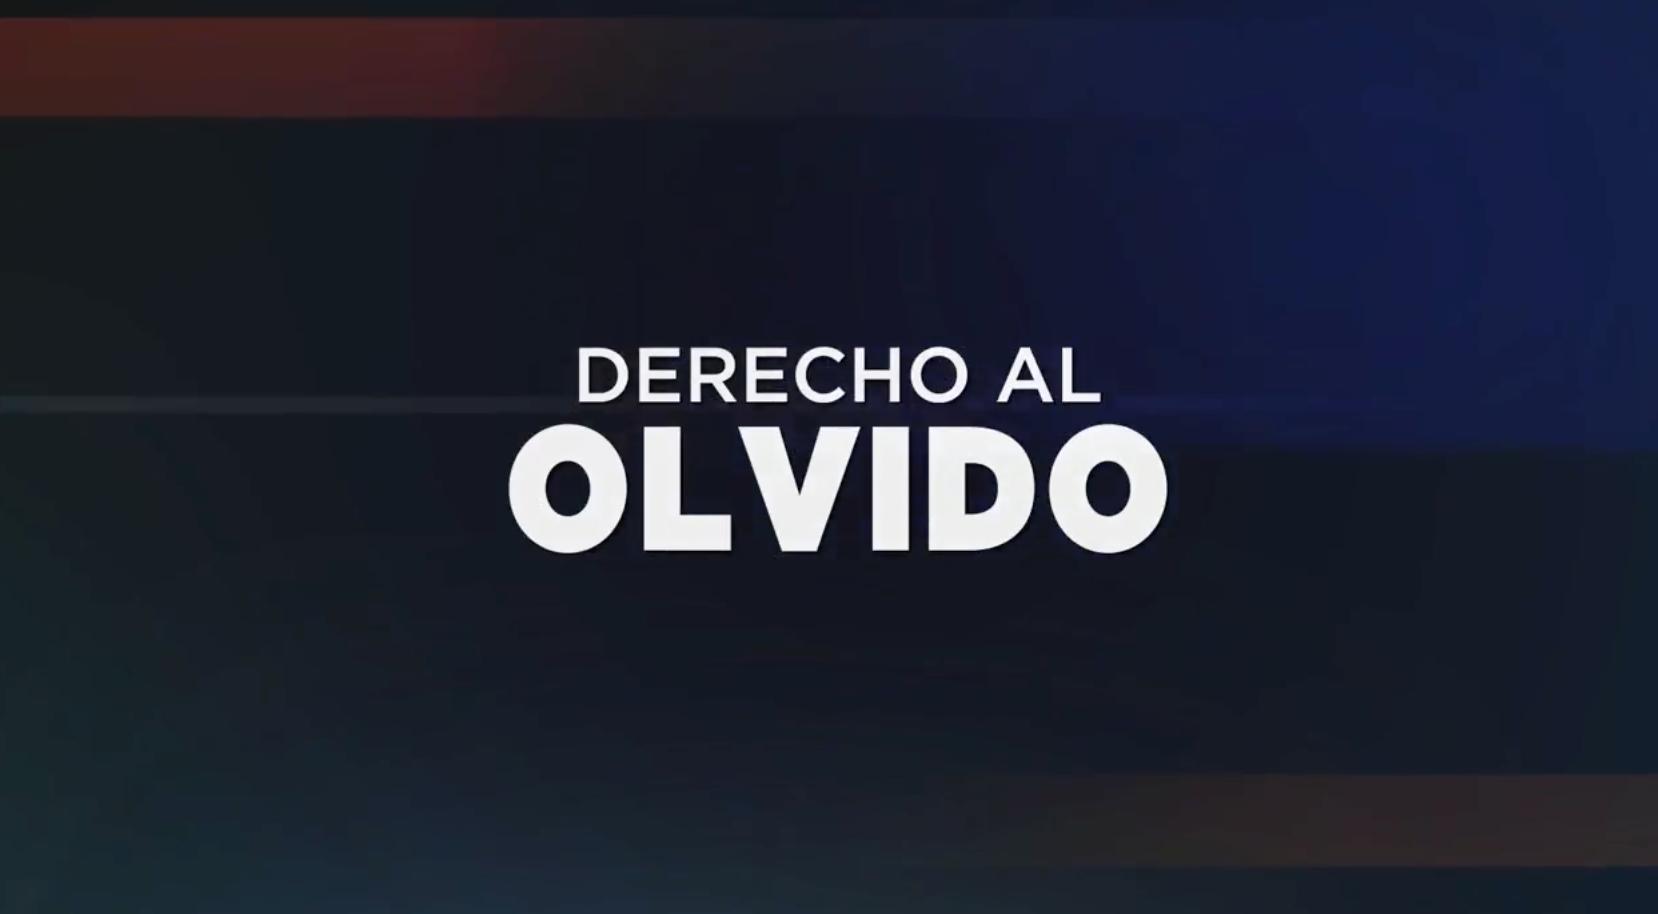 https://adalidmedrano.com/wp-content/uploads/2018/06/DERECHO-AL-OLVIDO.png